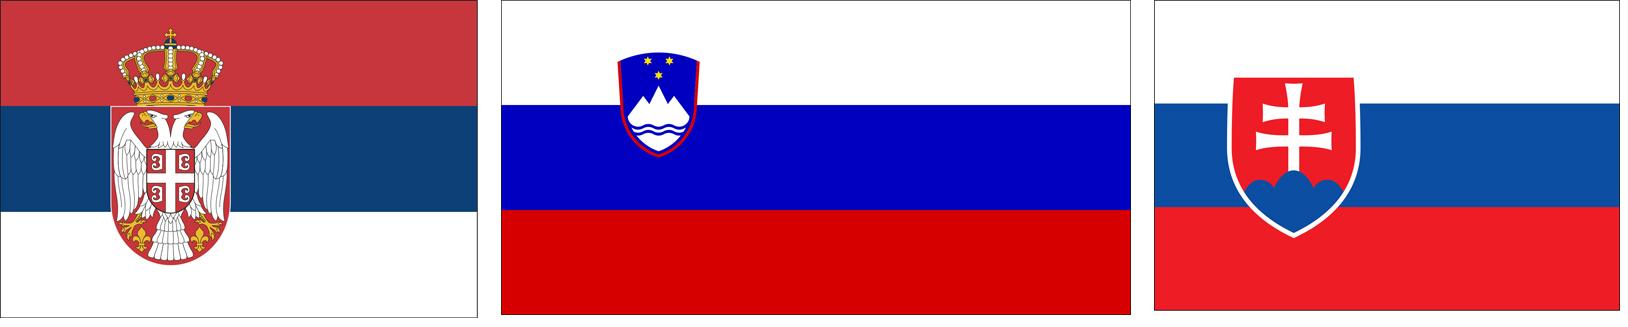 kroatie 03 servie slovenie slowakije